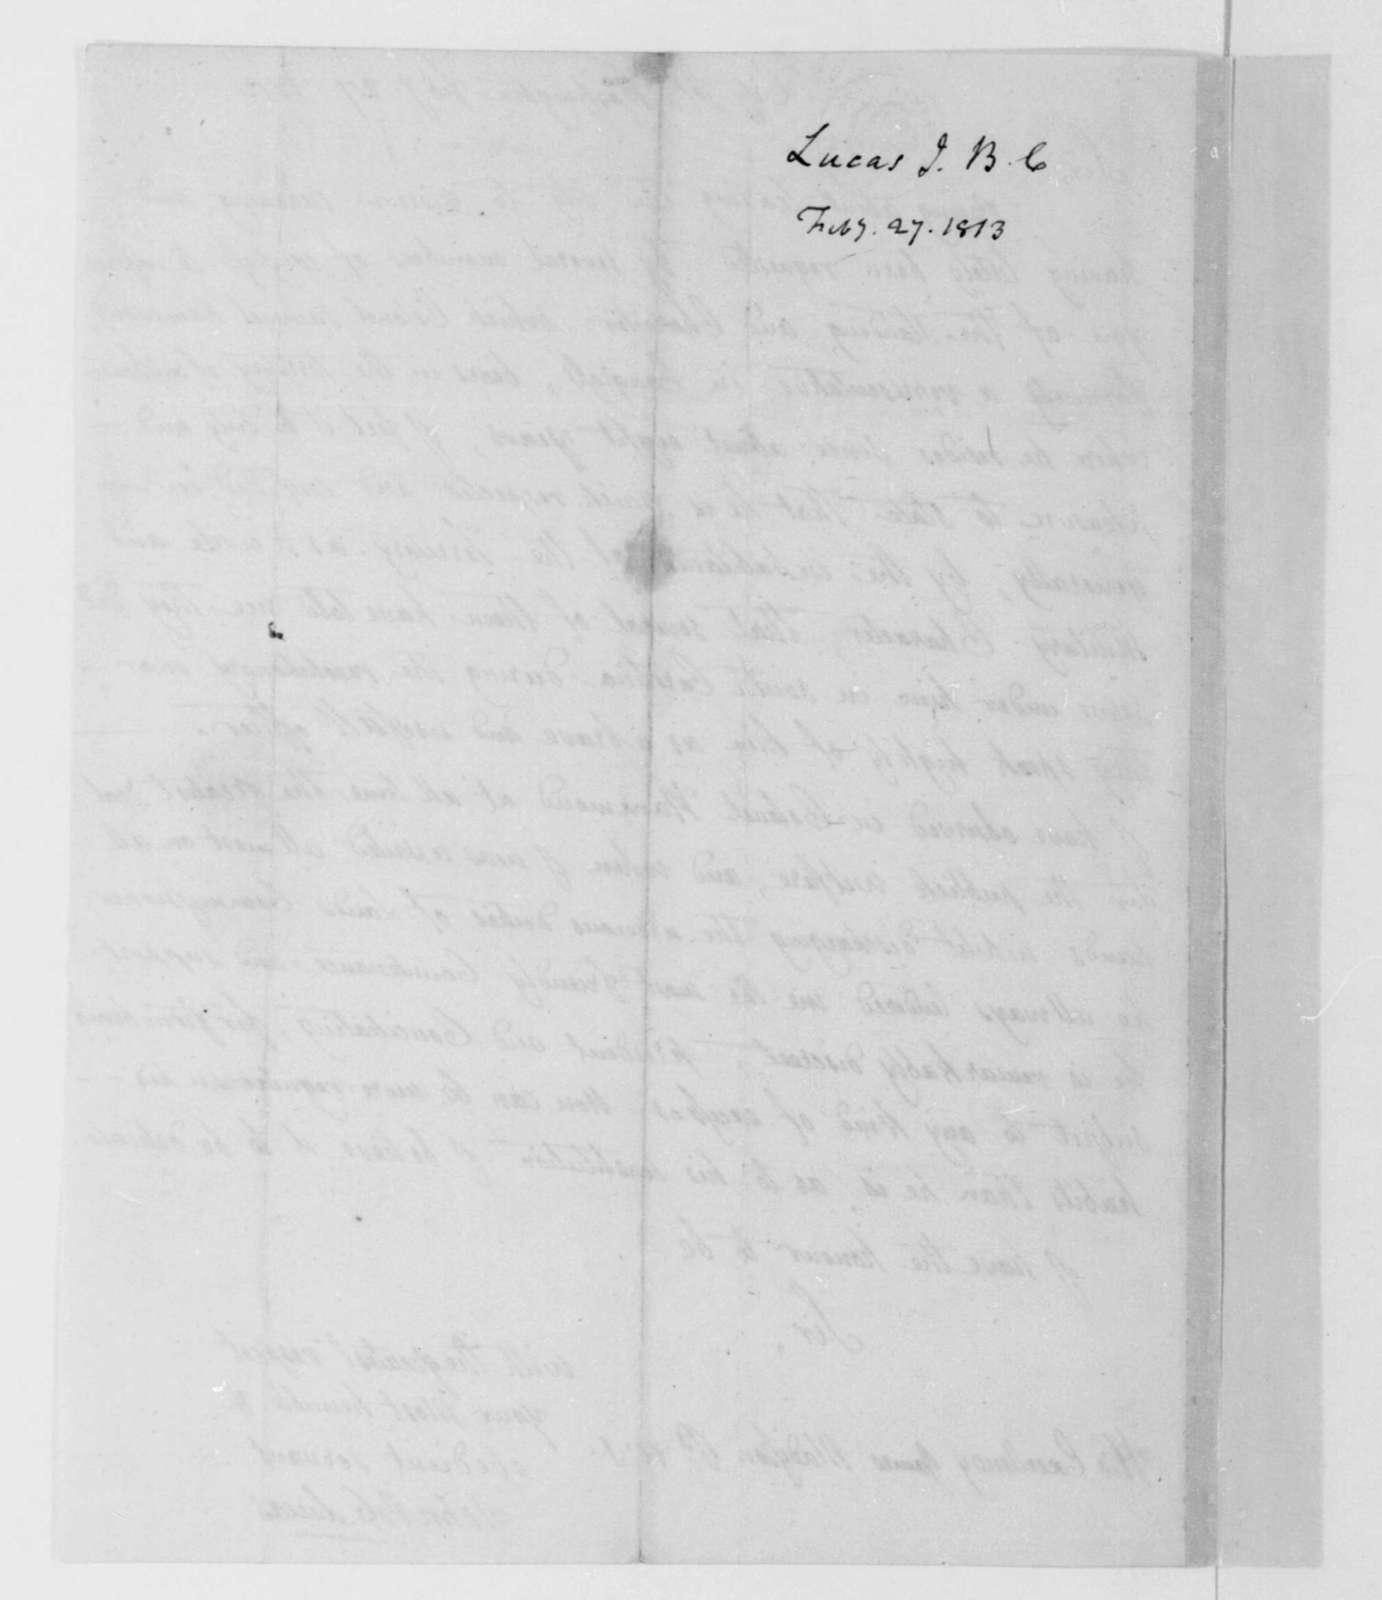 John B. C. Lucas to James Madison, February 27, 1813.